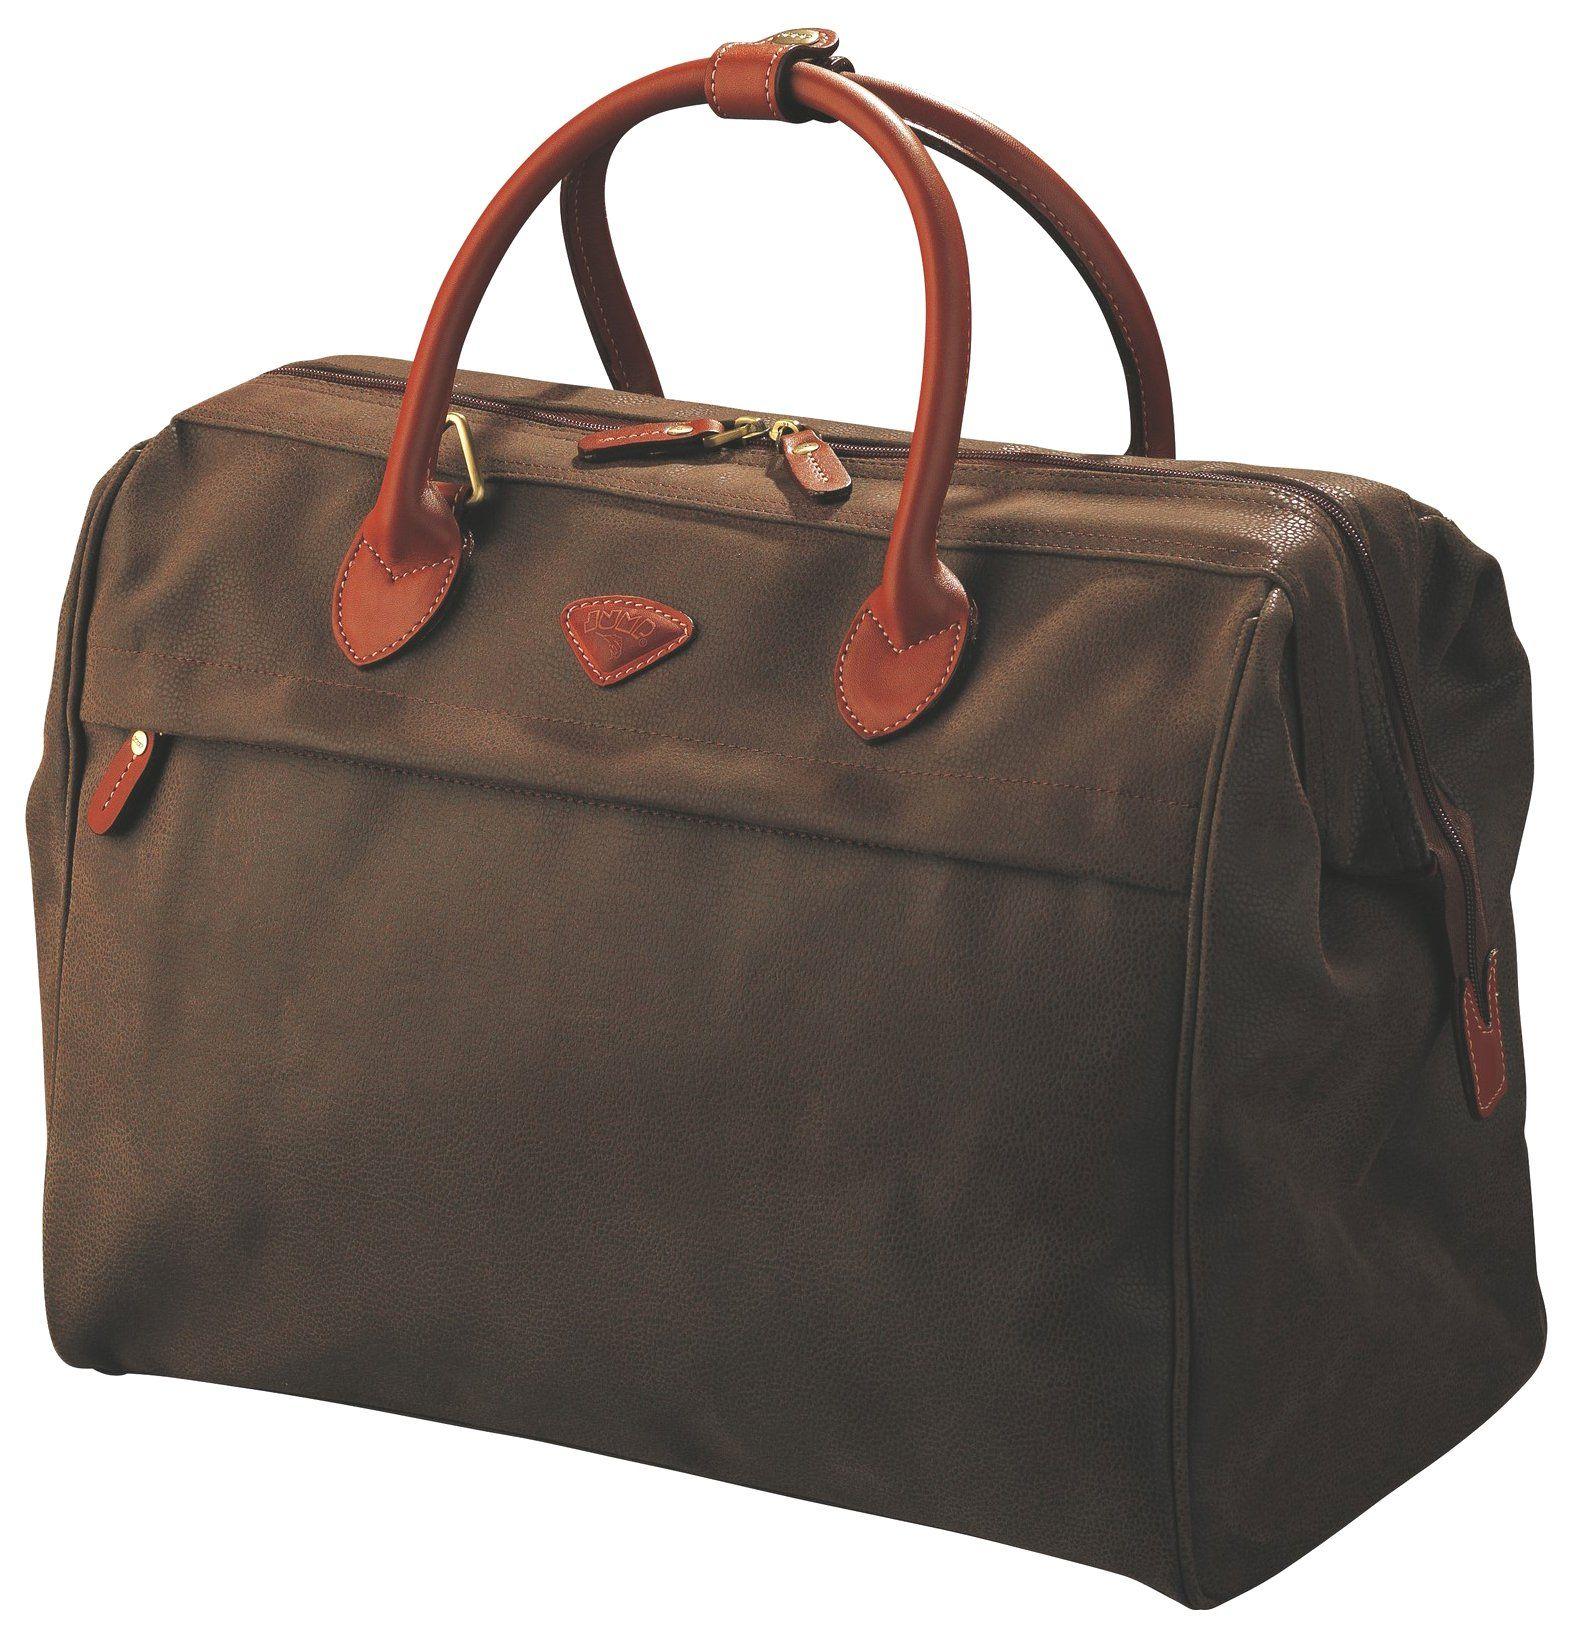 Kangol Designer Small Holdall Travel Cabin Luggage Baggage Flight Carry Bag